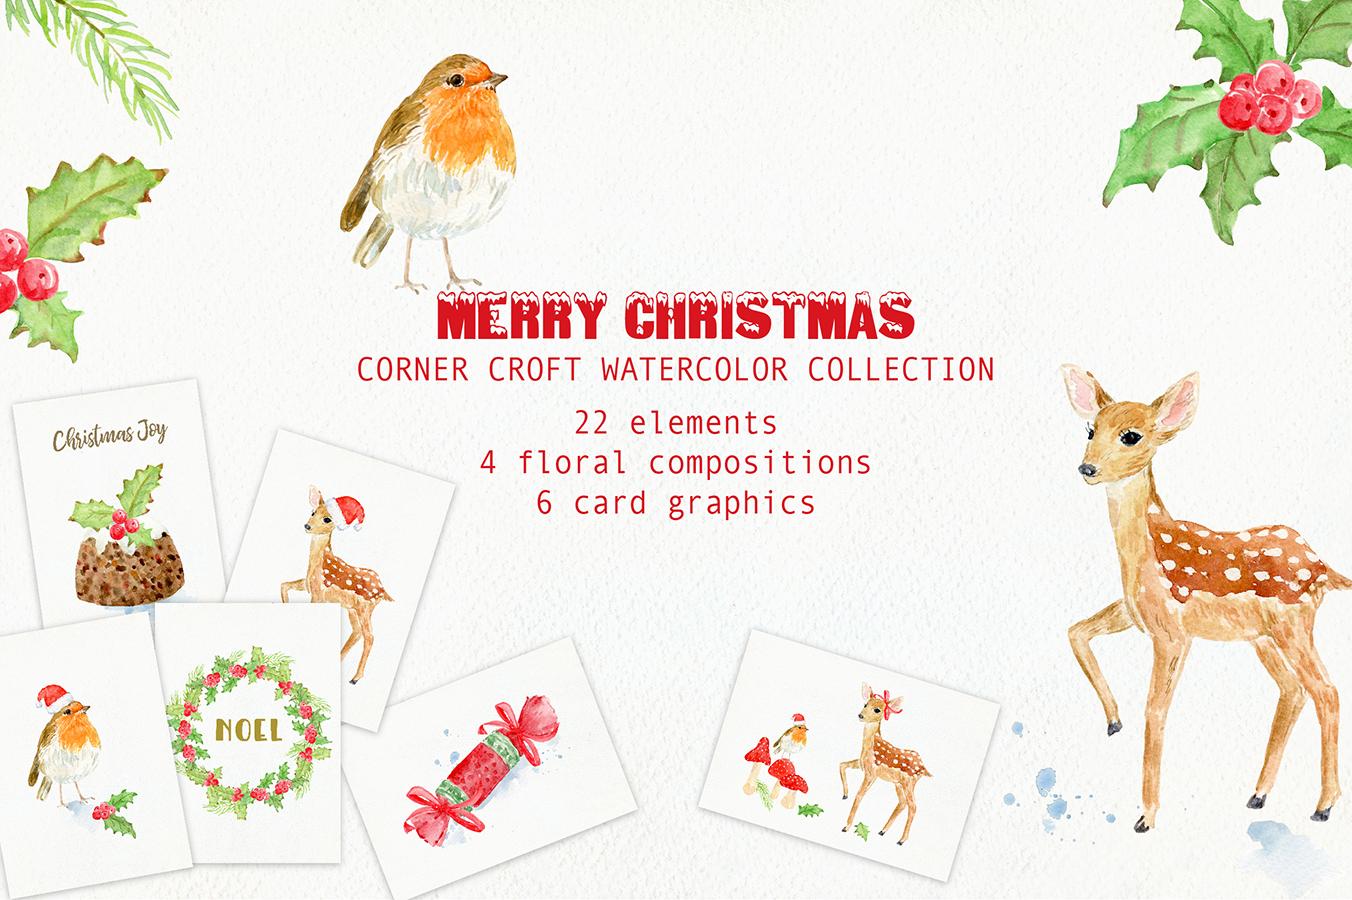 Watercolor Christmas Card Design Kit example image 1